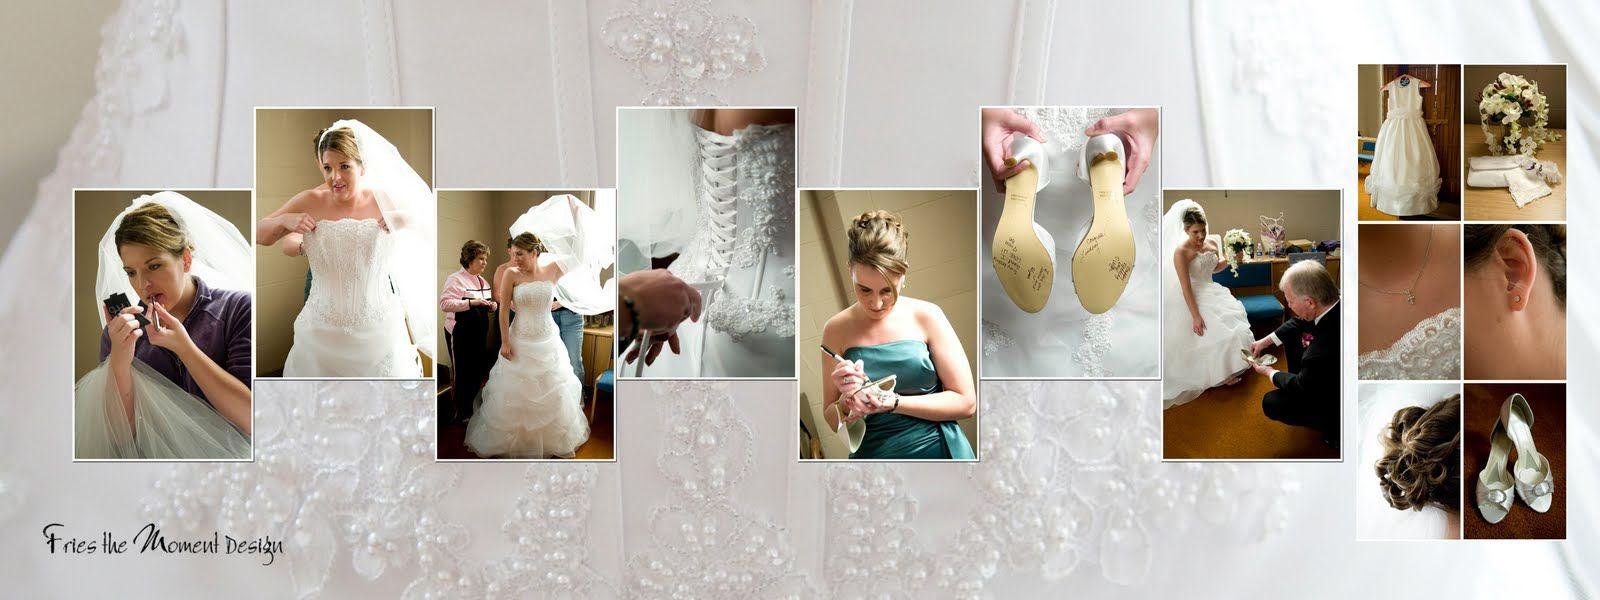 17 best images about album design on pinterest design dutch and the angel - Wedding Album Design Ideas